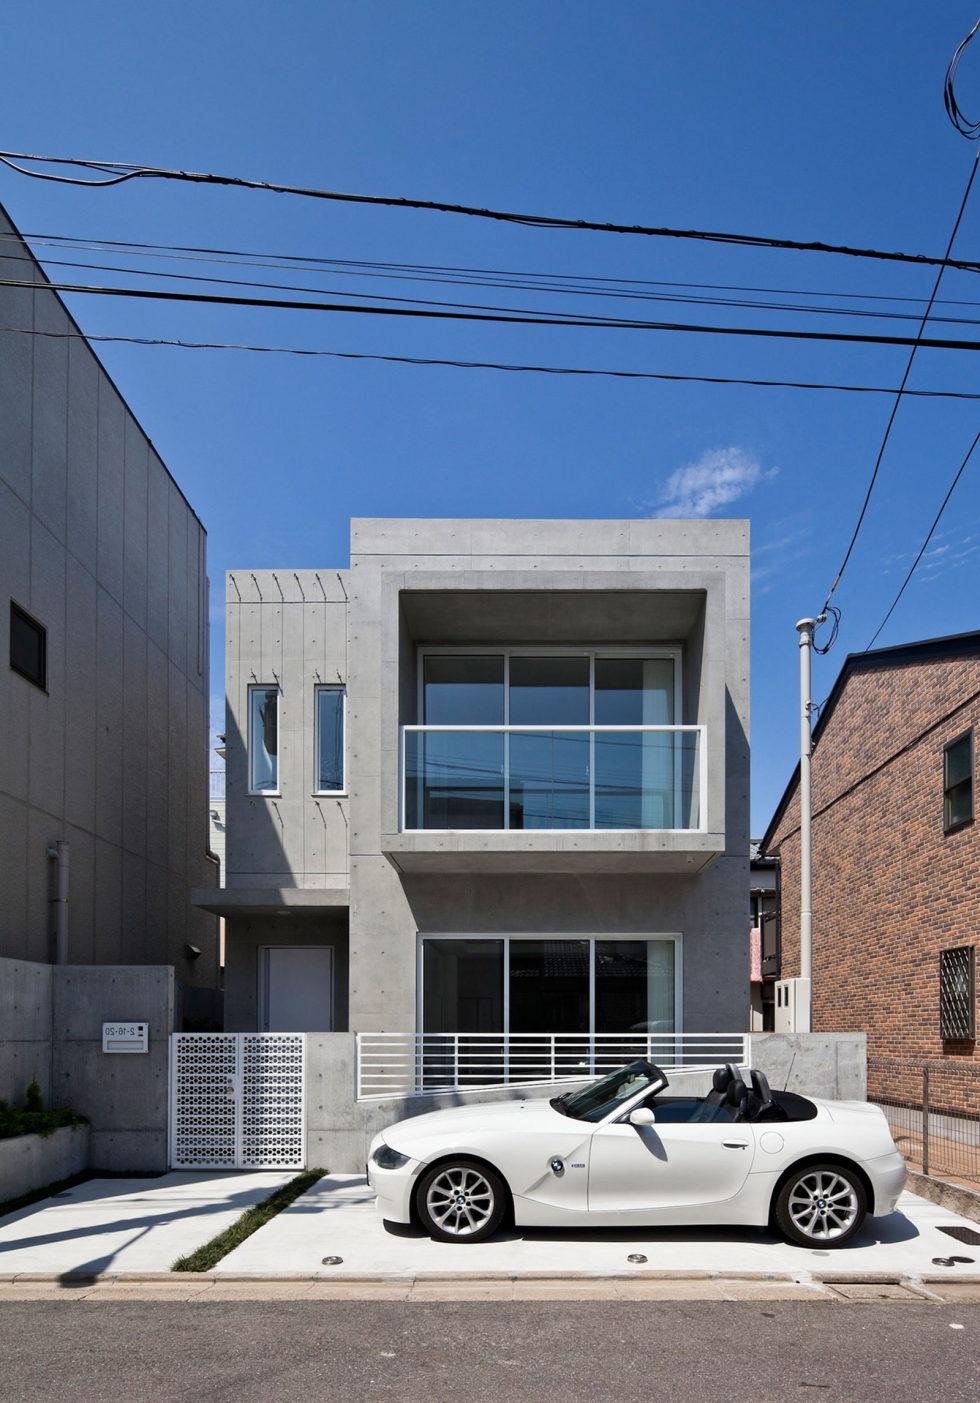 Zen Design House From RCK Design Studio In Japan 2